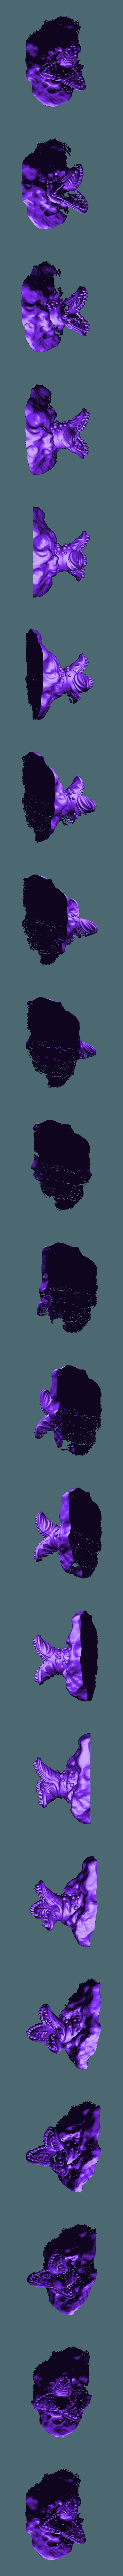 worm1.stl Download free STL file The Space Set • 3D print design, HeribertoValle